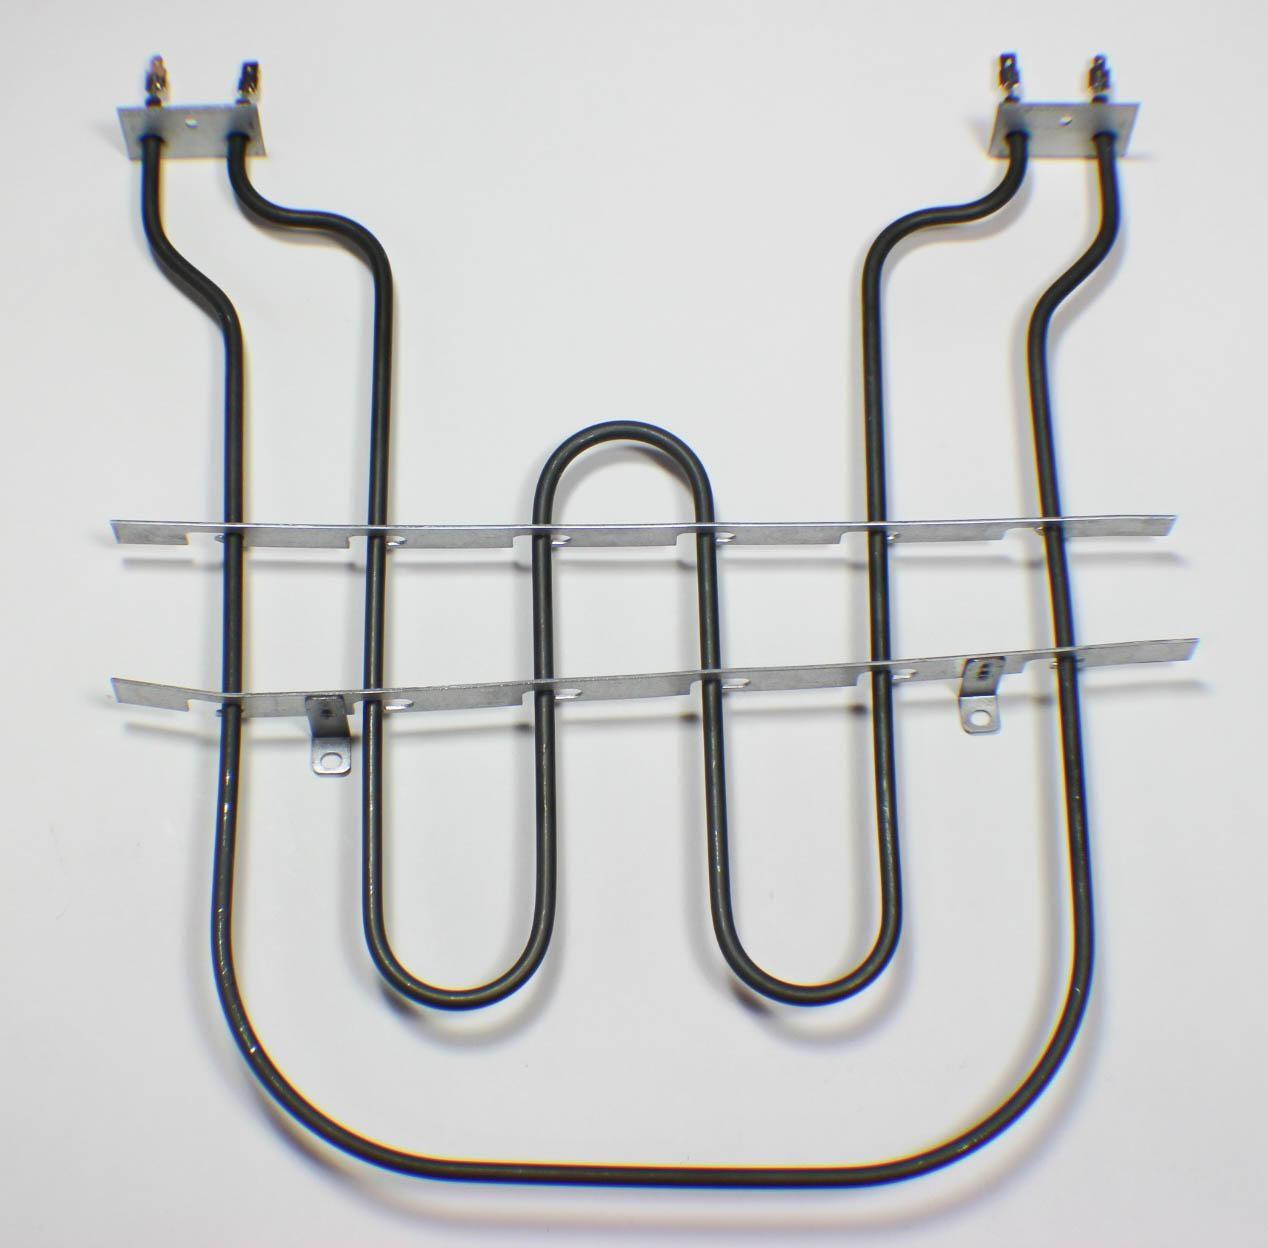 9760774 Whirlpool Stove Oven Range Element-BroilOxford Ka OEM 9760774